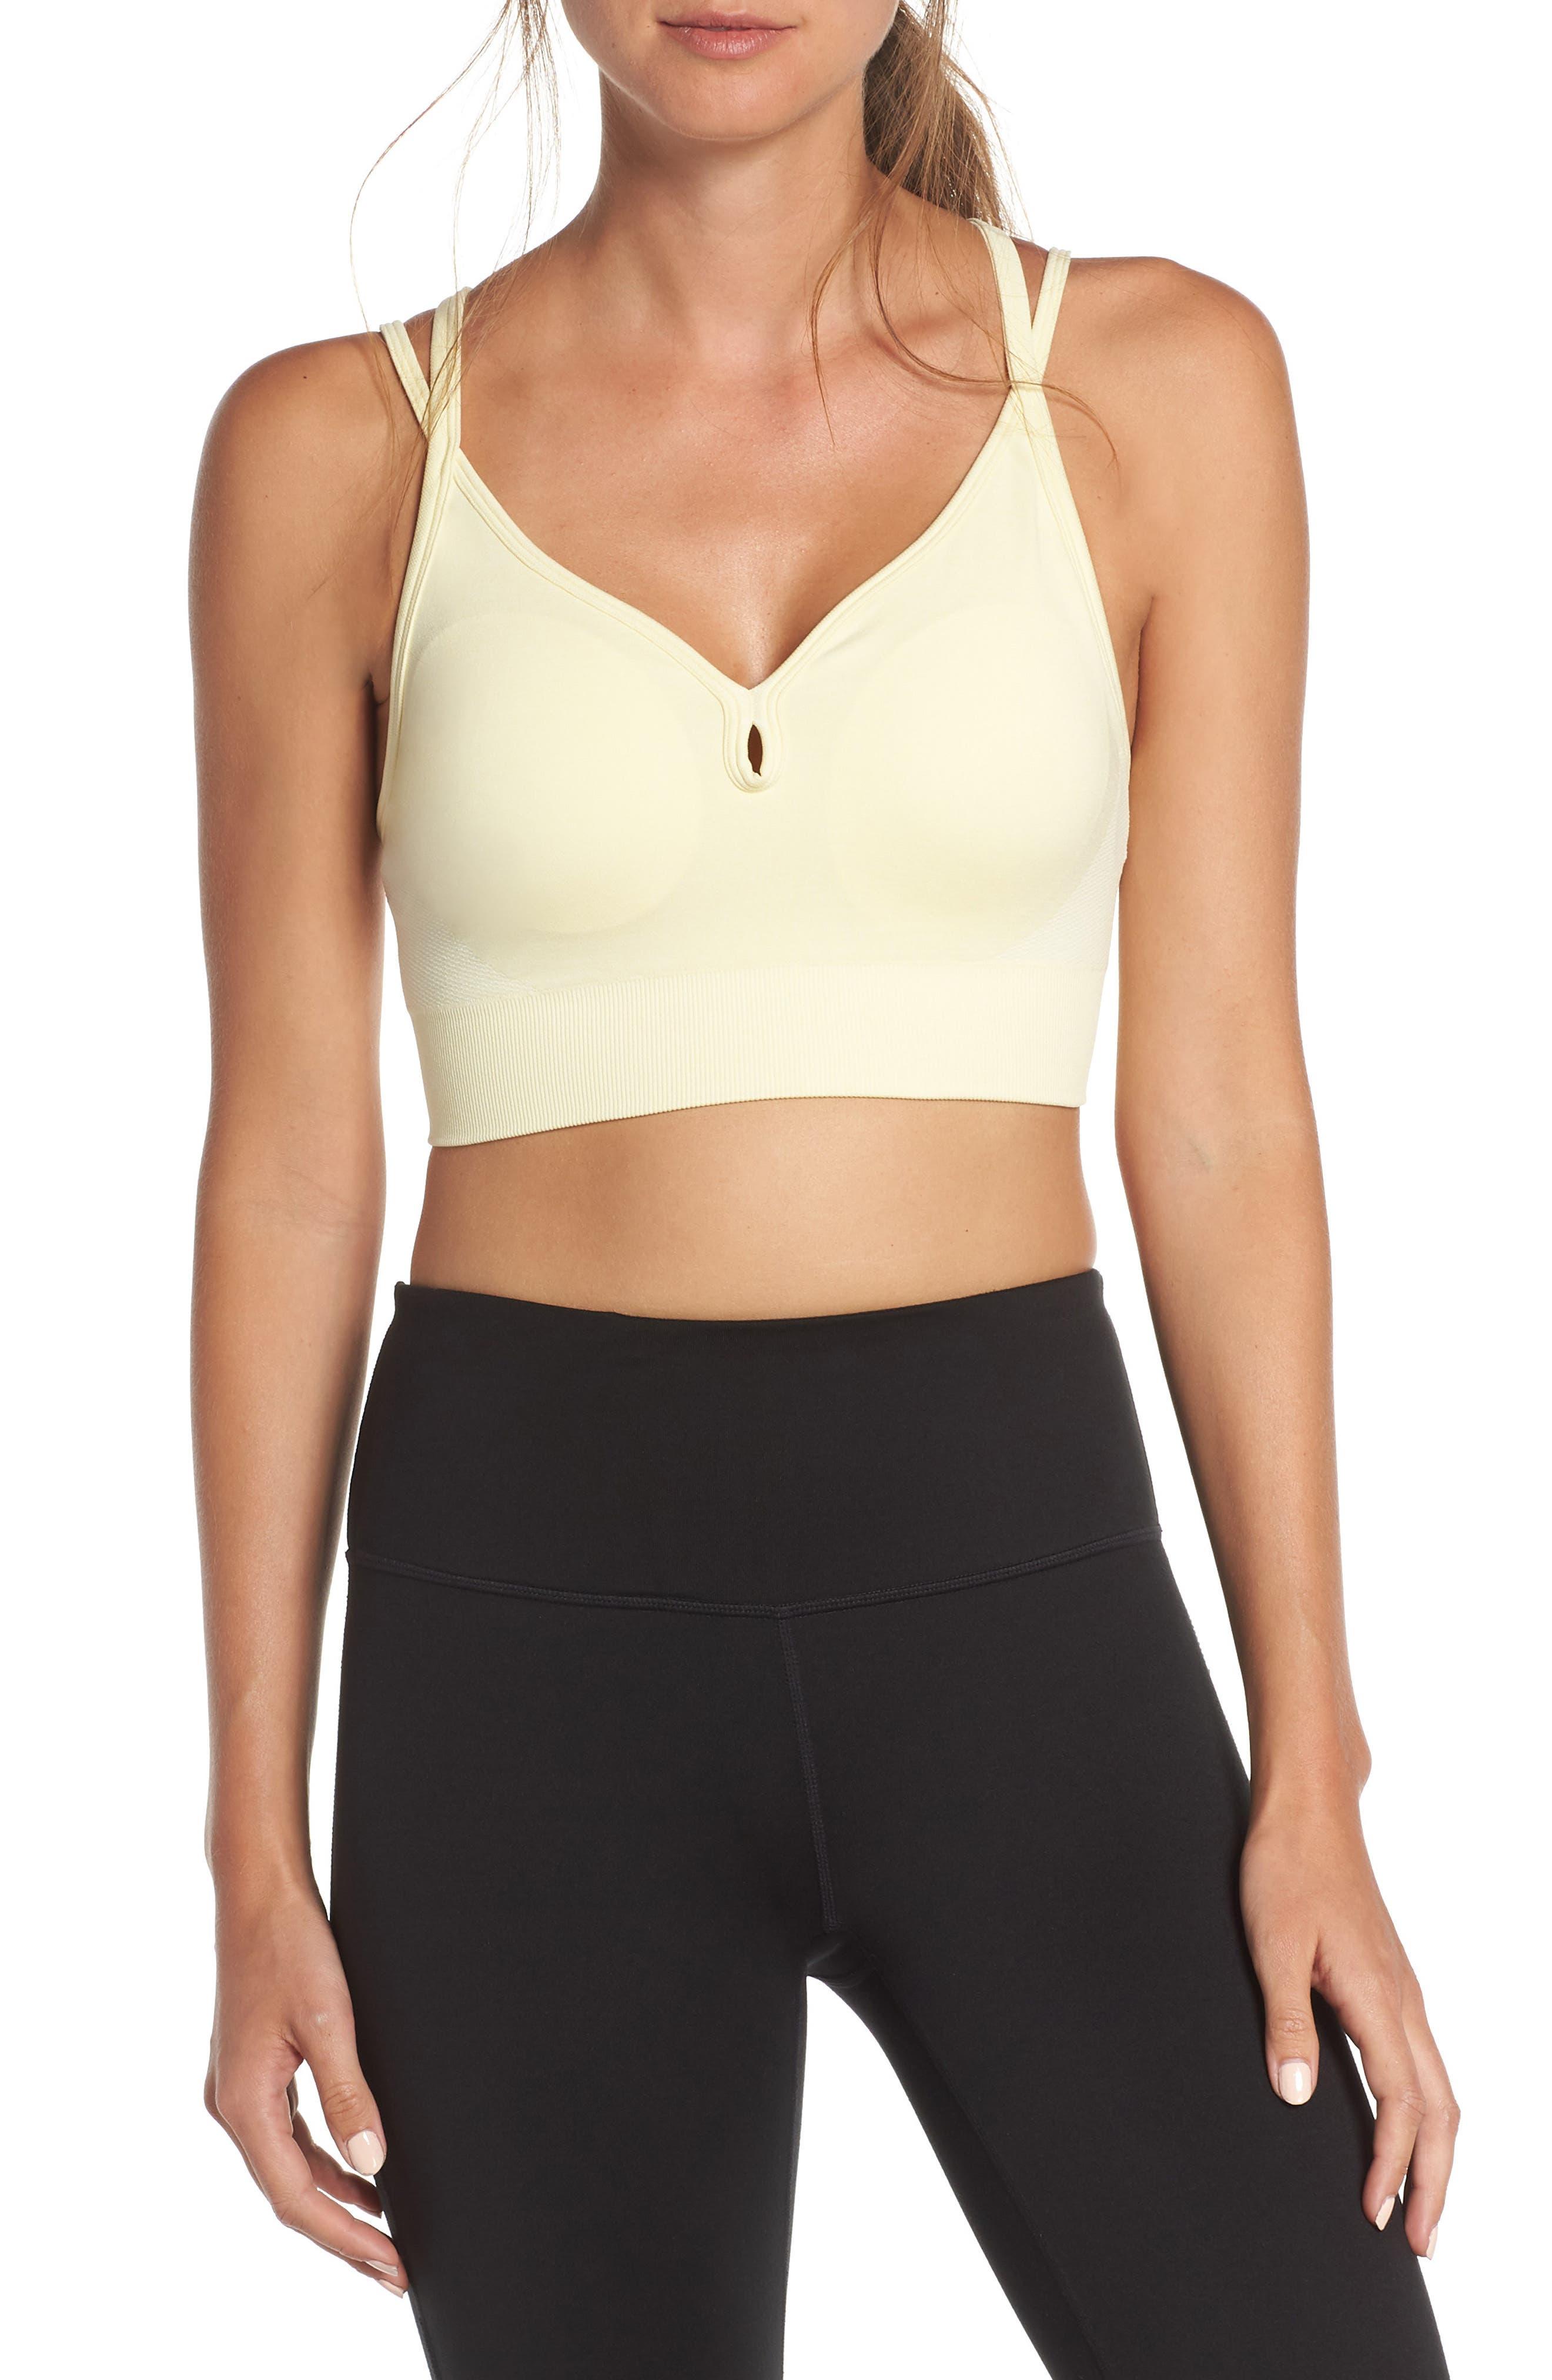 Zella Body Rhythm Sports Bra (2 For $68)